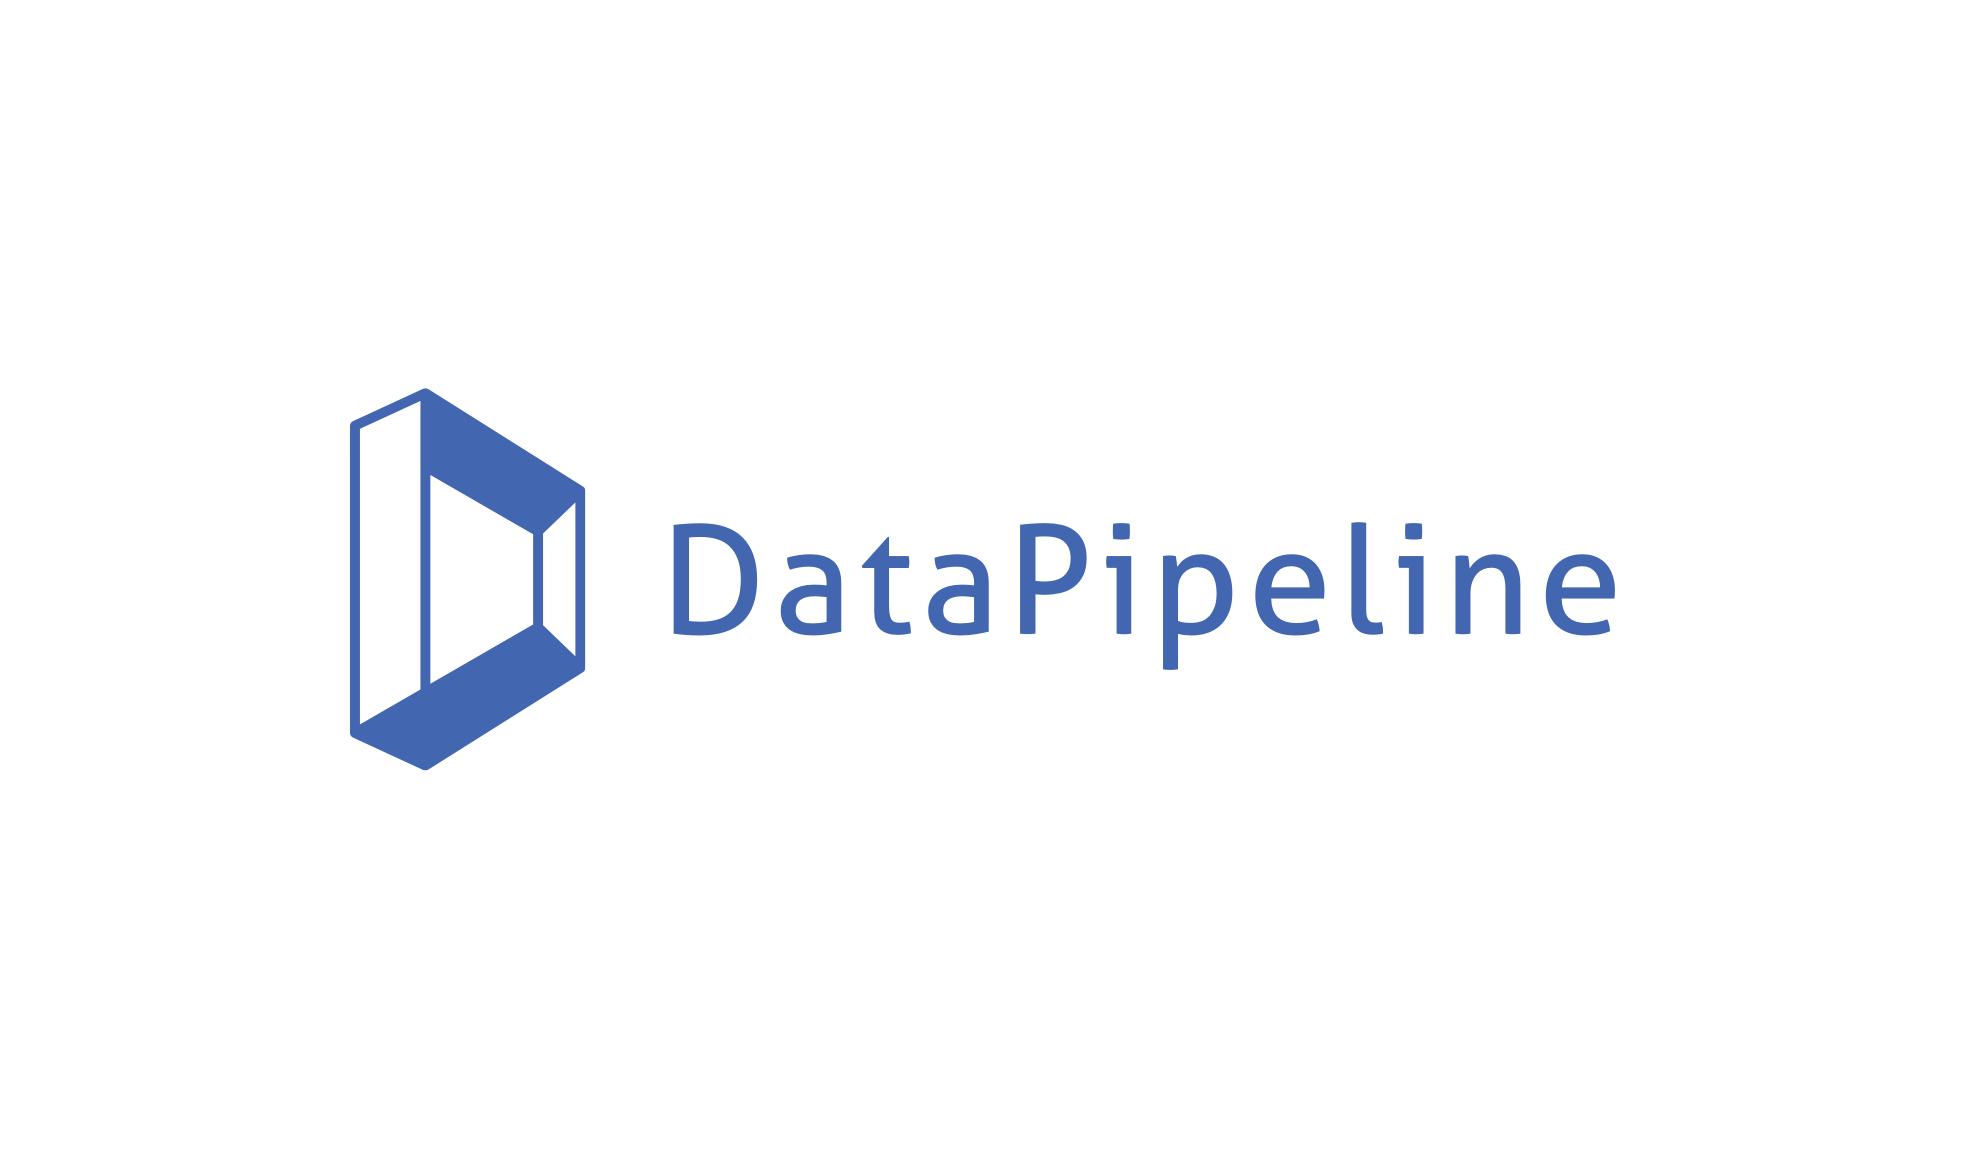 DataPipeline